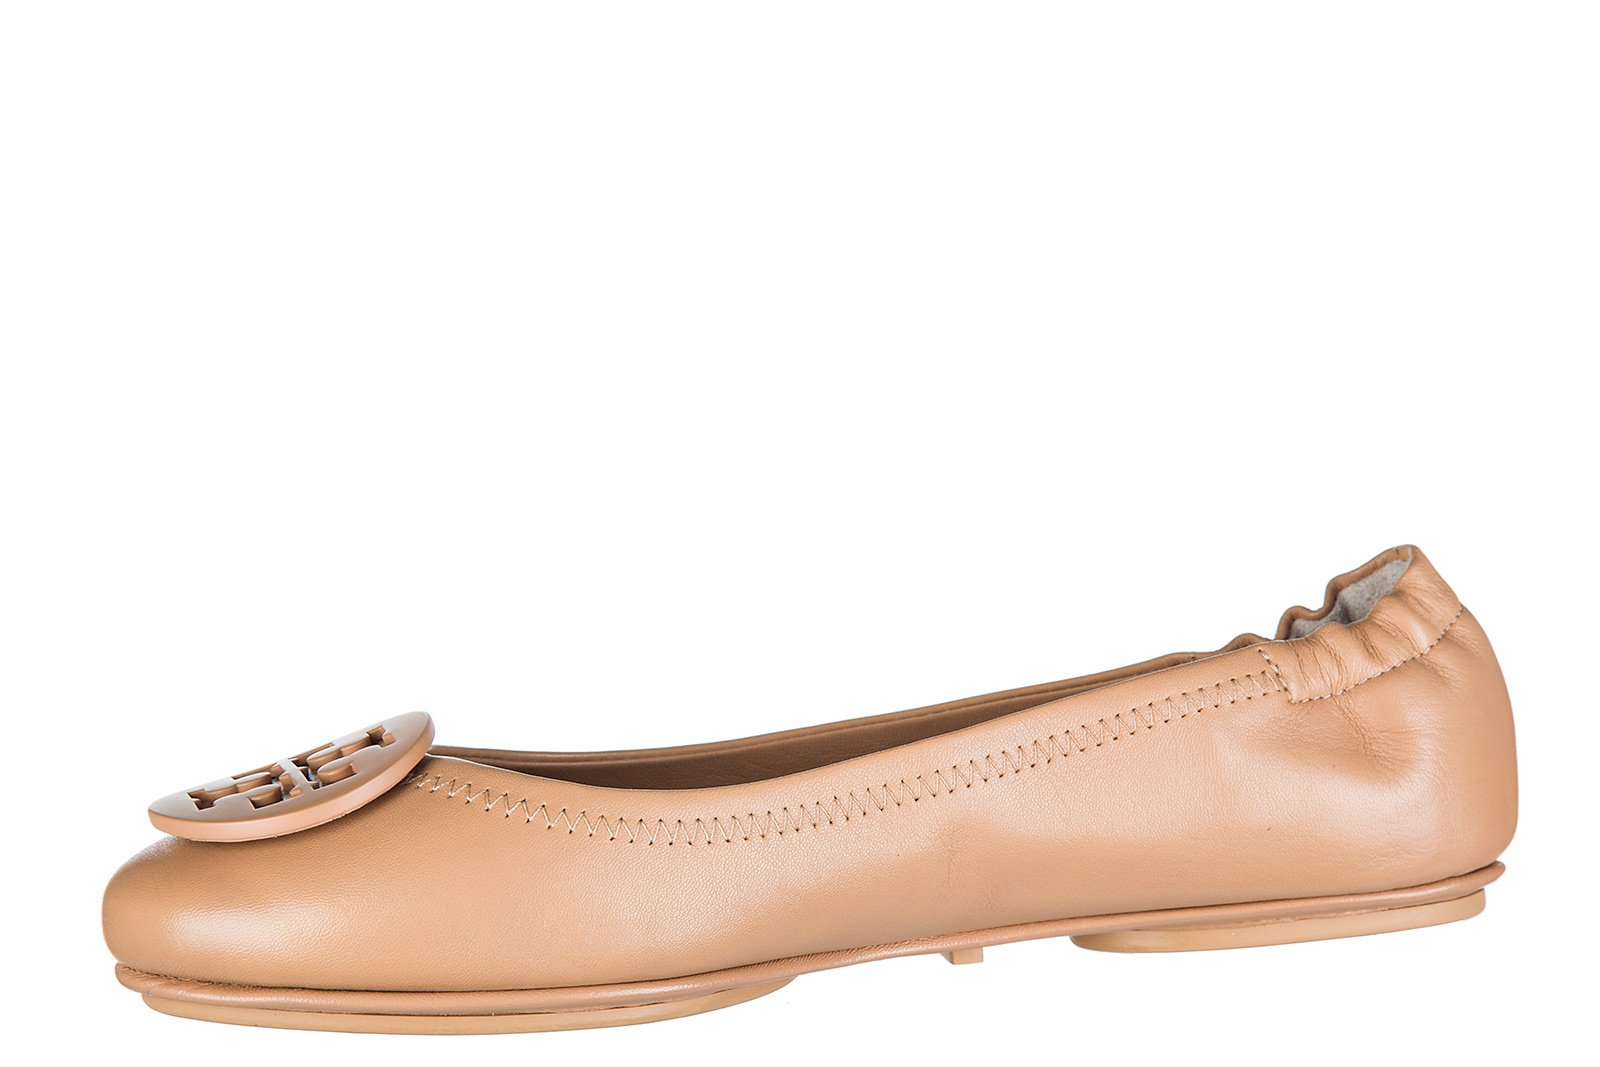 Tory Burch Women's Leather Ballet Flats Ballerinas Minnie Brown US Size 7.5 51158251254 image https://media.buyr.com/yFlfHexwLYGqNP6QWtlKqw-FbIlNlnuo4Zbyn94rKk8kw.jpg1